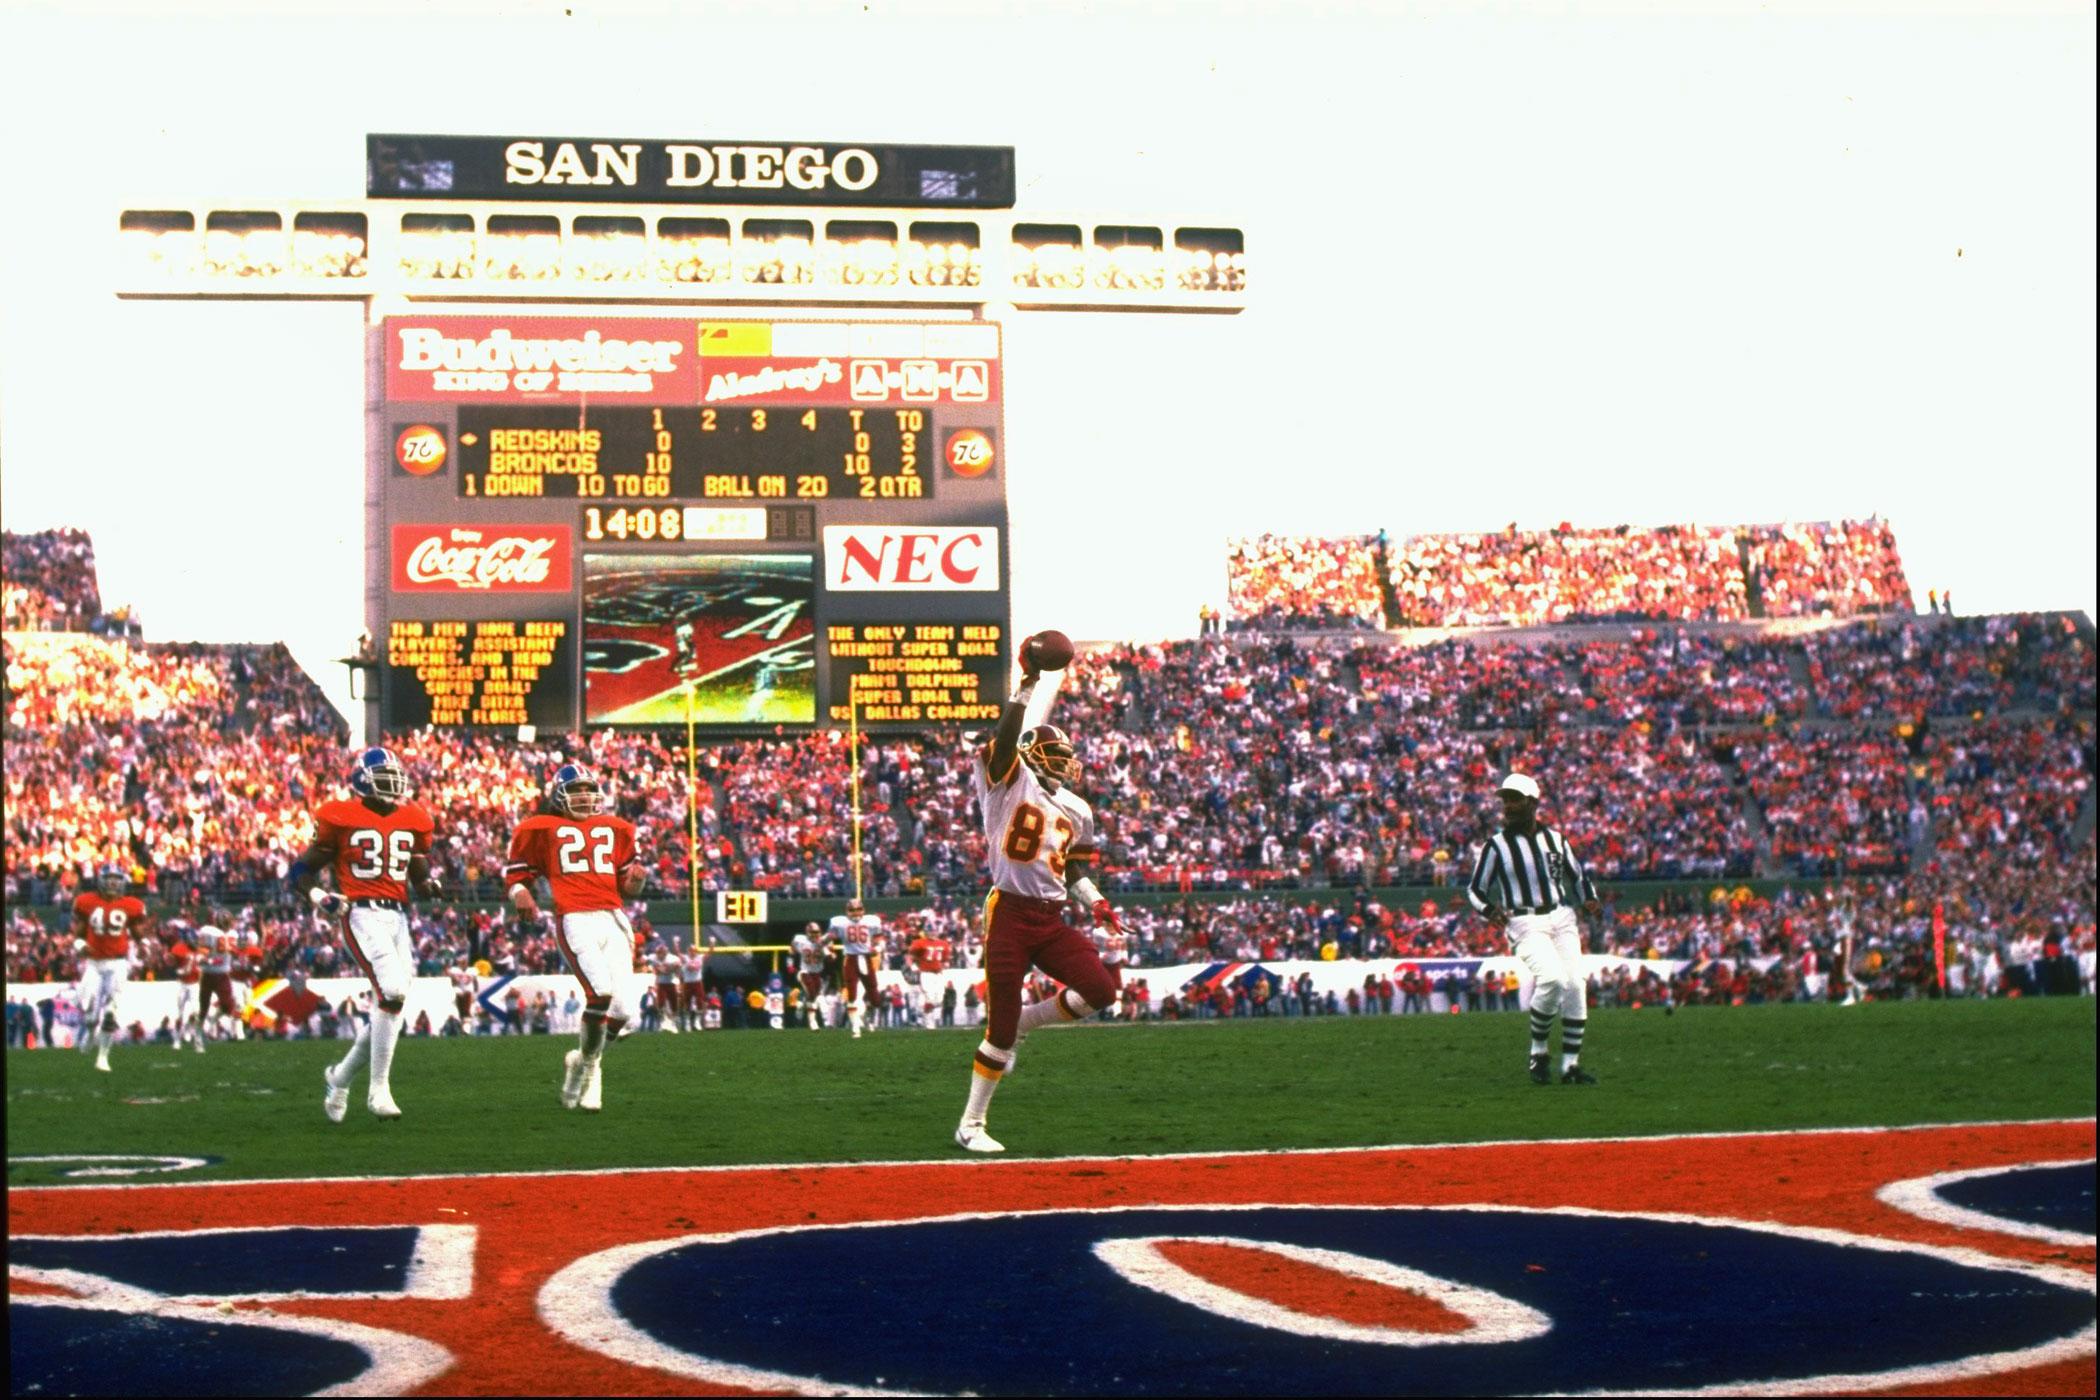 Super Bowl XXII, Jan. 31, 1988                               Washington Redskins vs Denver Broncos in San Diego